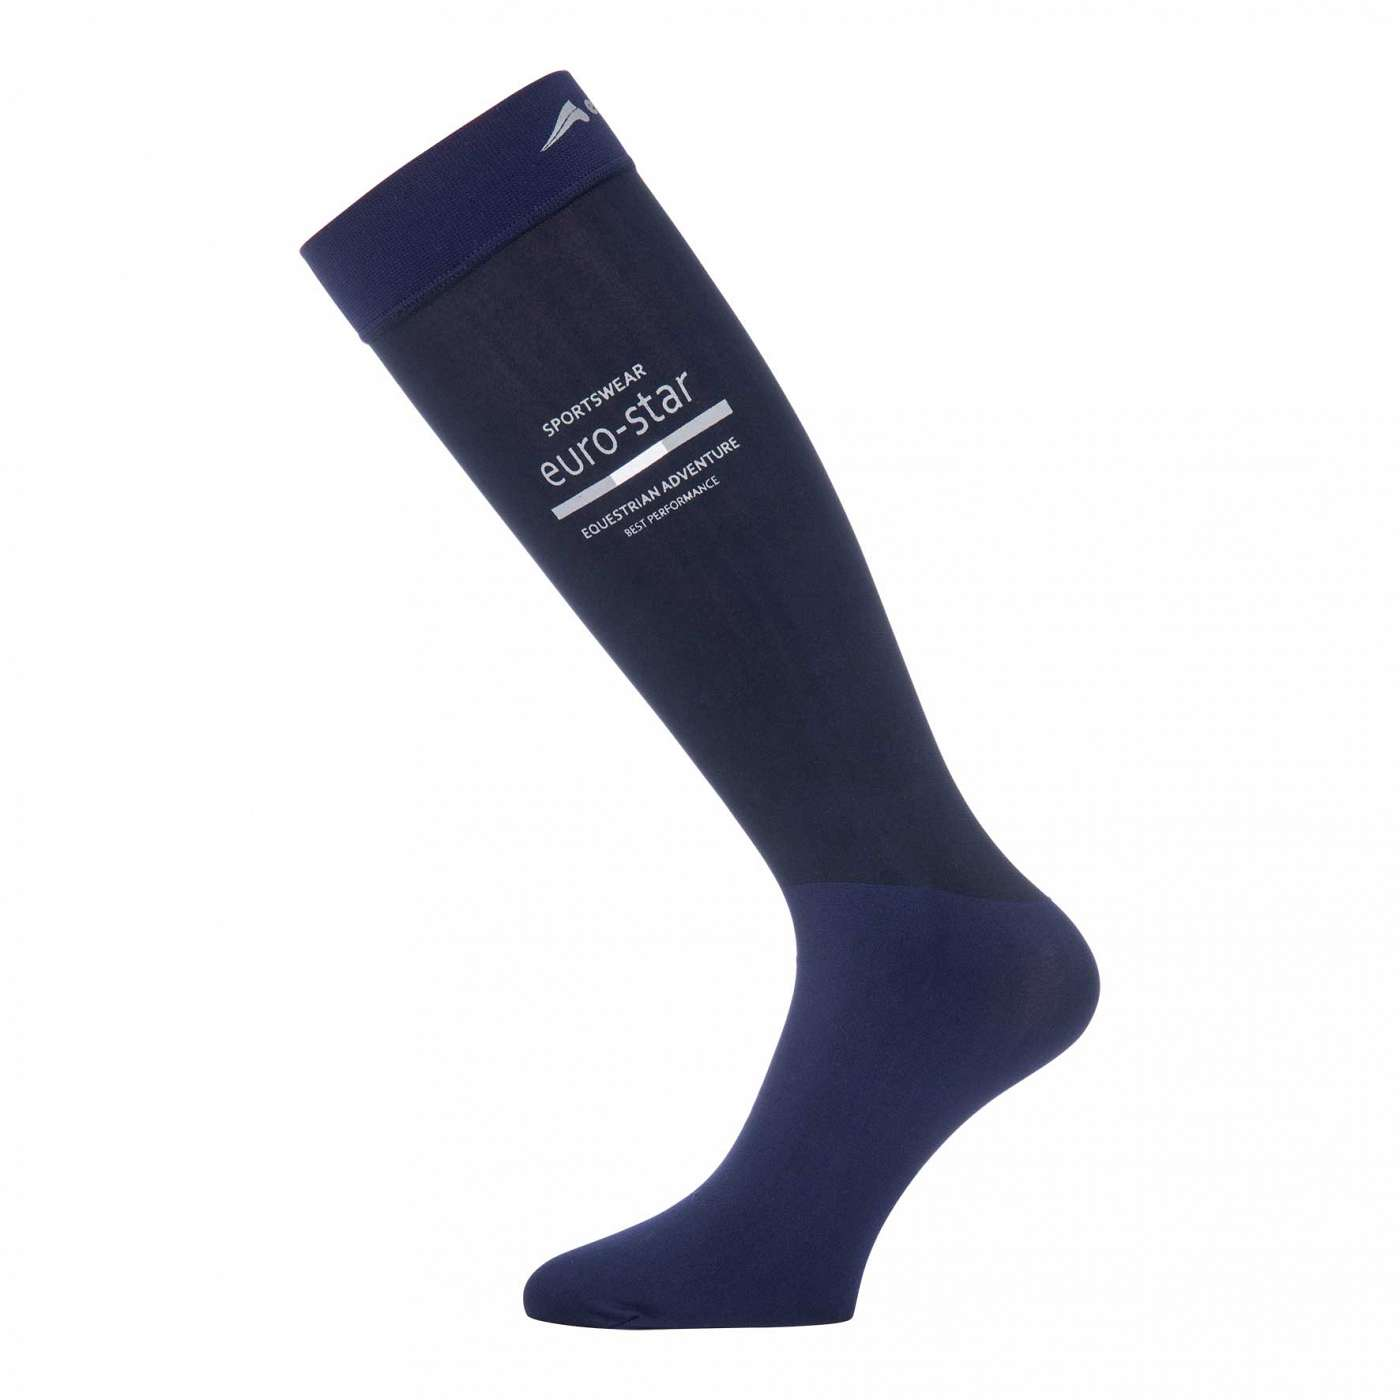 euro_tech_socks_navy